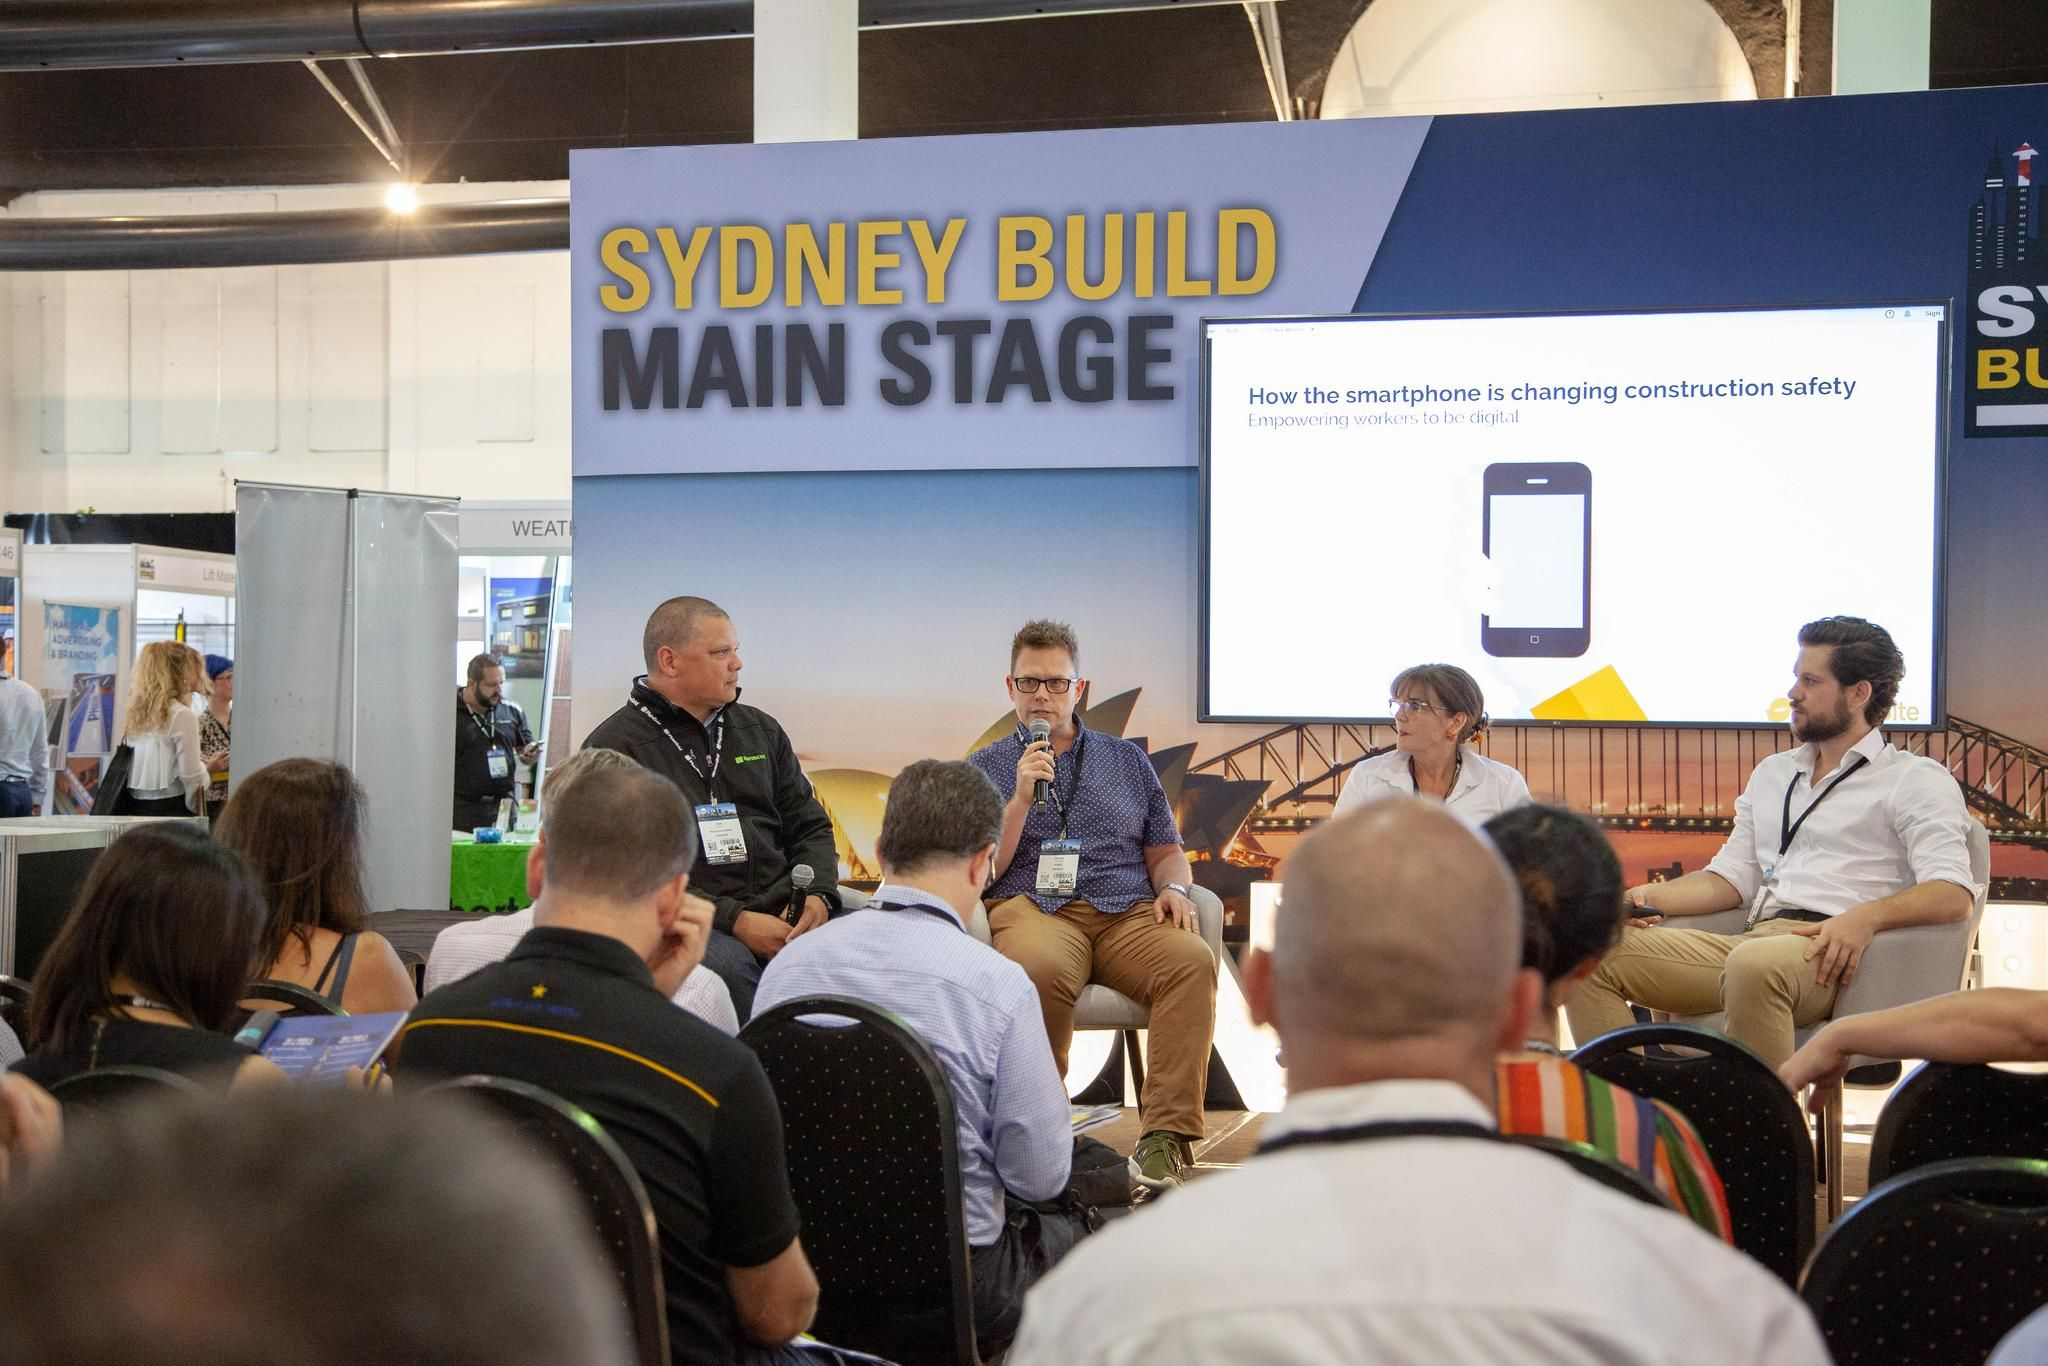 Sydney Build Main Stage